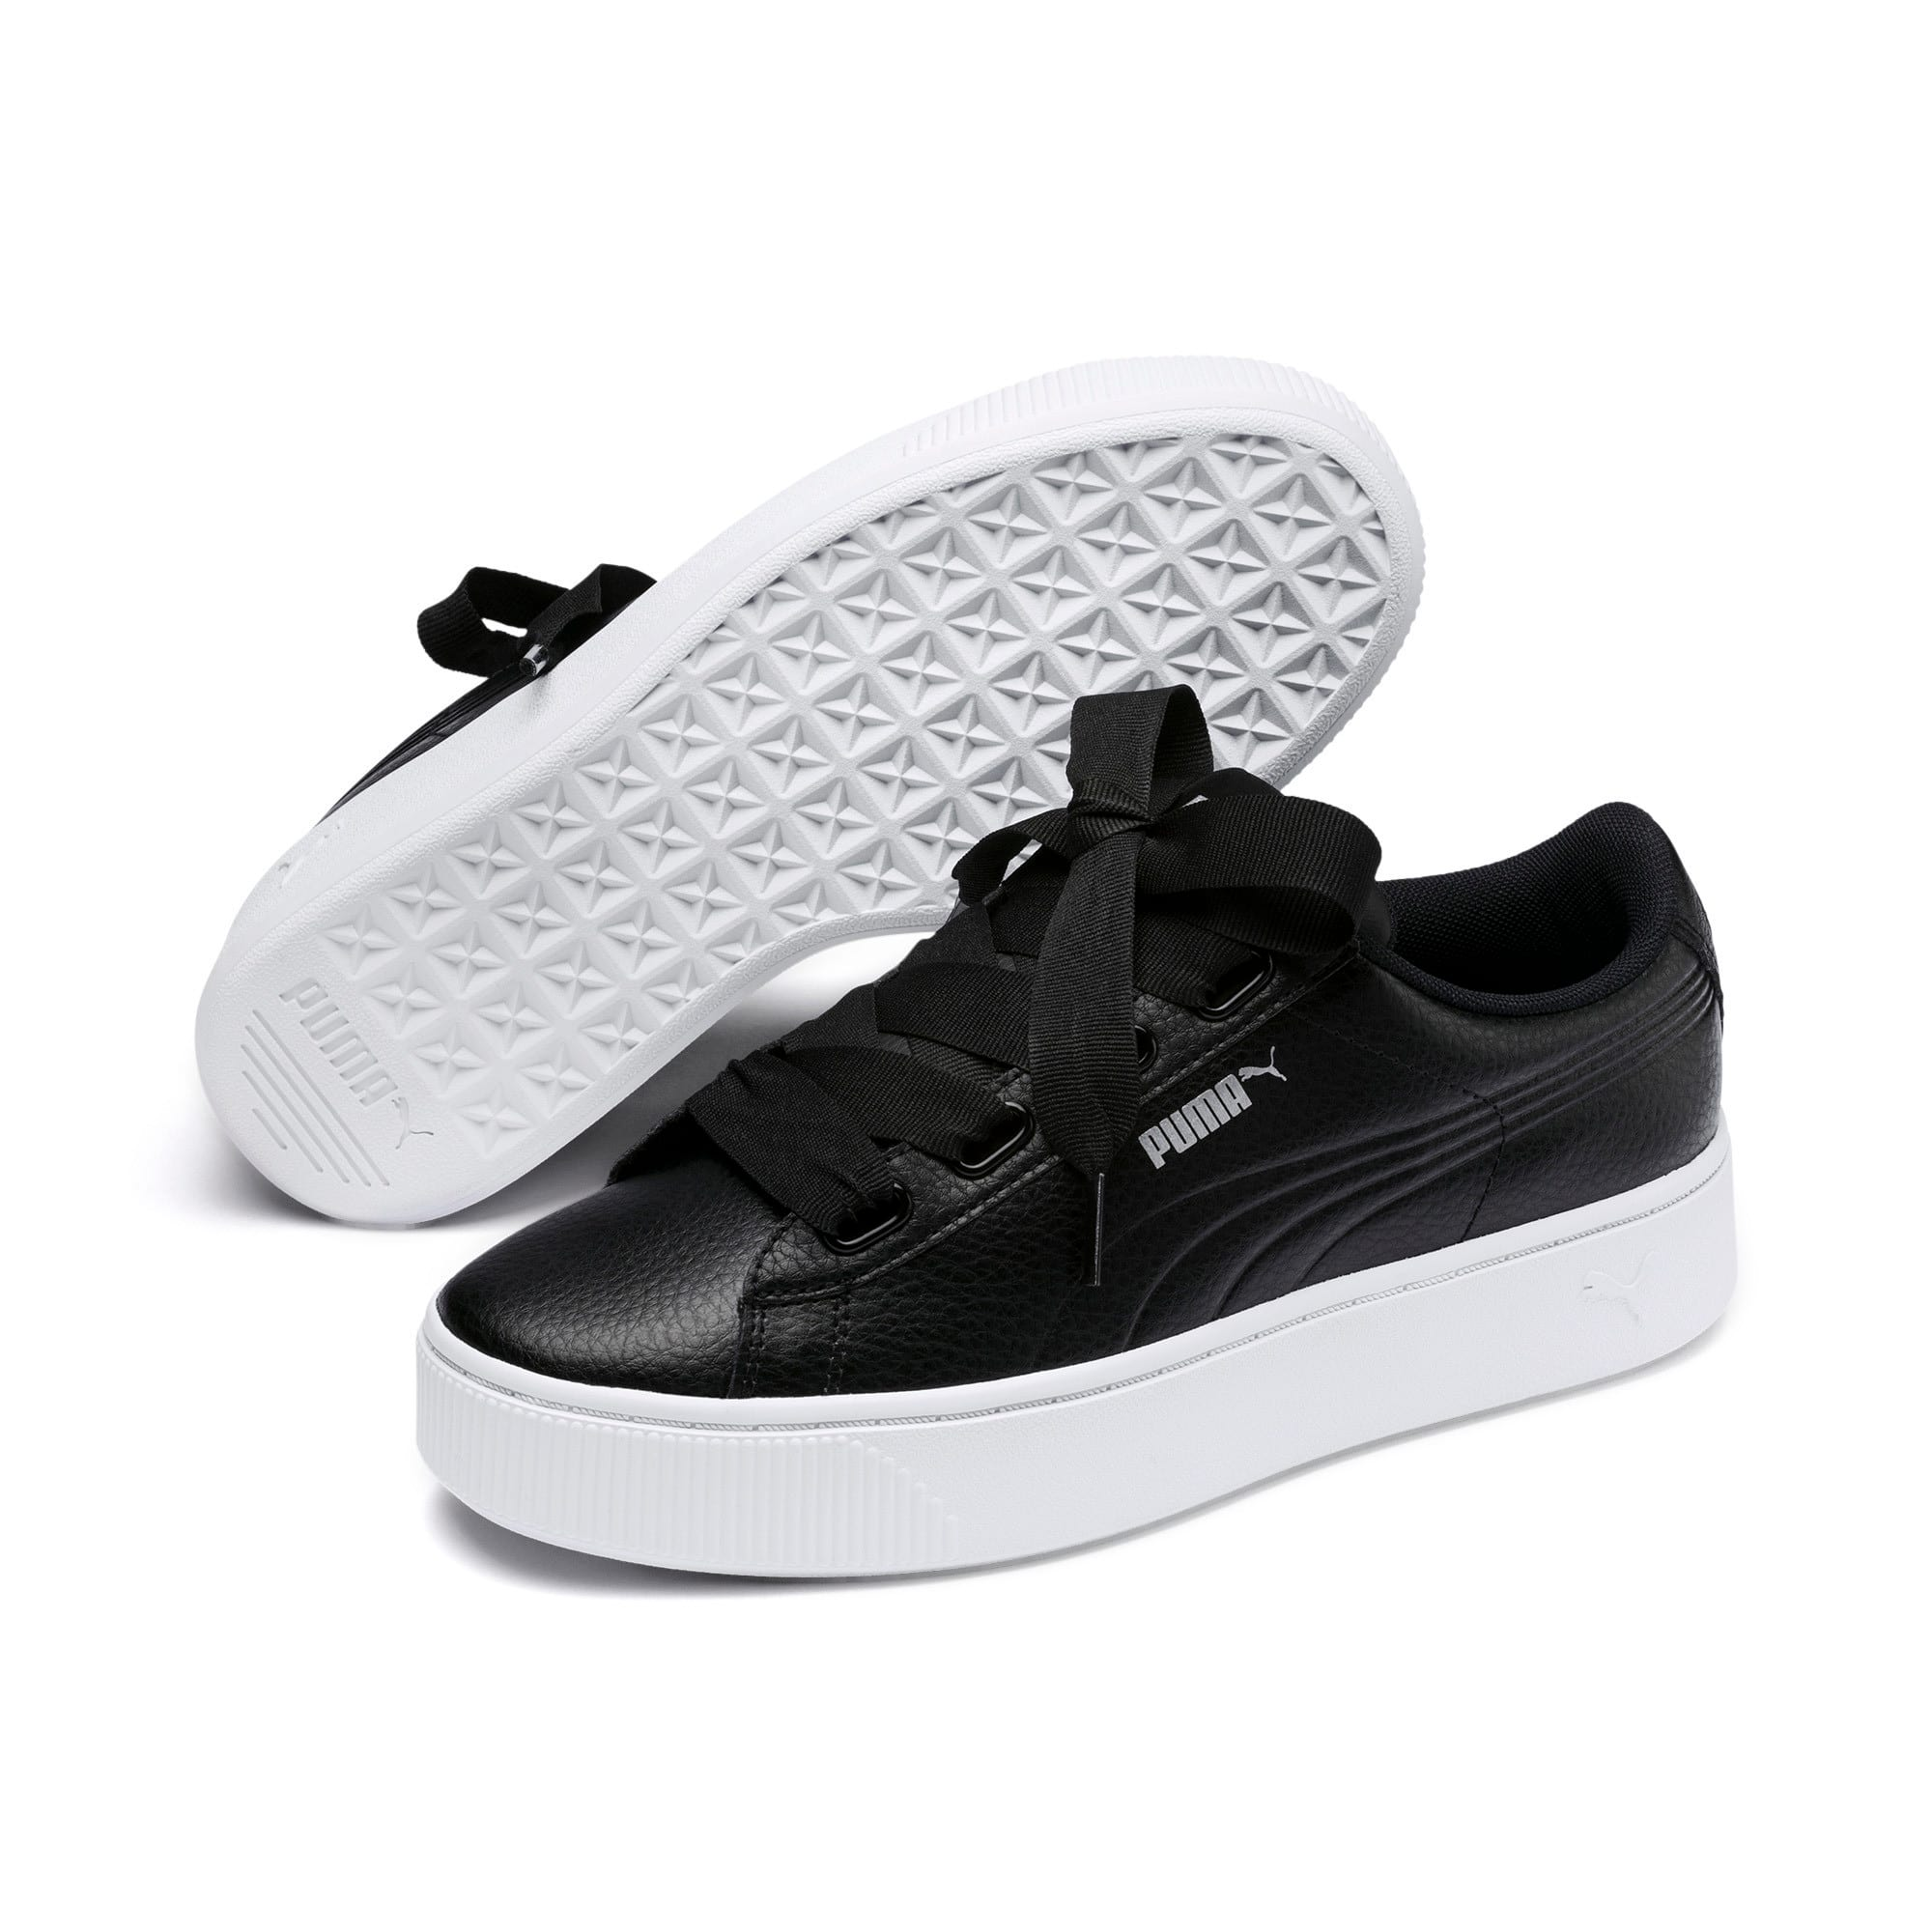 Thumbnail 2 of PUMA Vikky Stacked Ribbon Core Women's Sneakers, Puma Black-Puma Black, medium